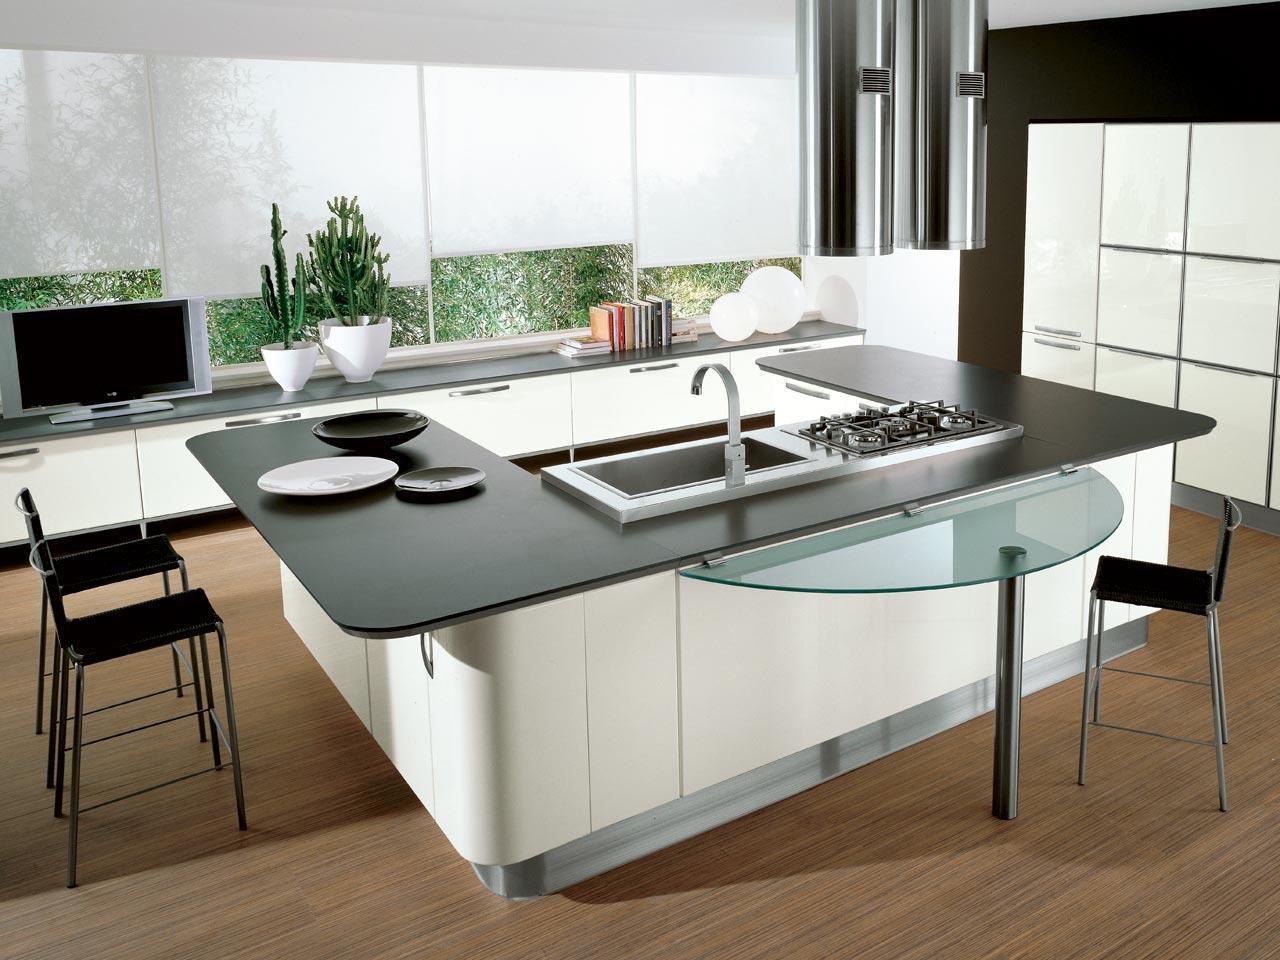 u shaped kitchen island photo - 4